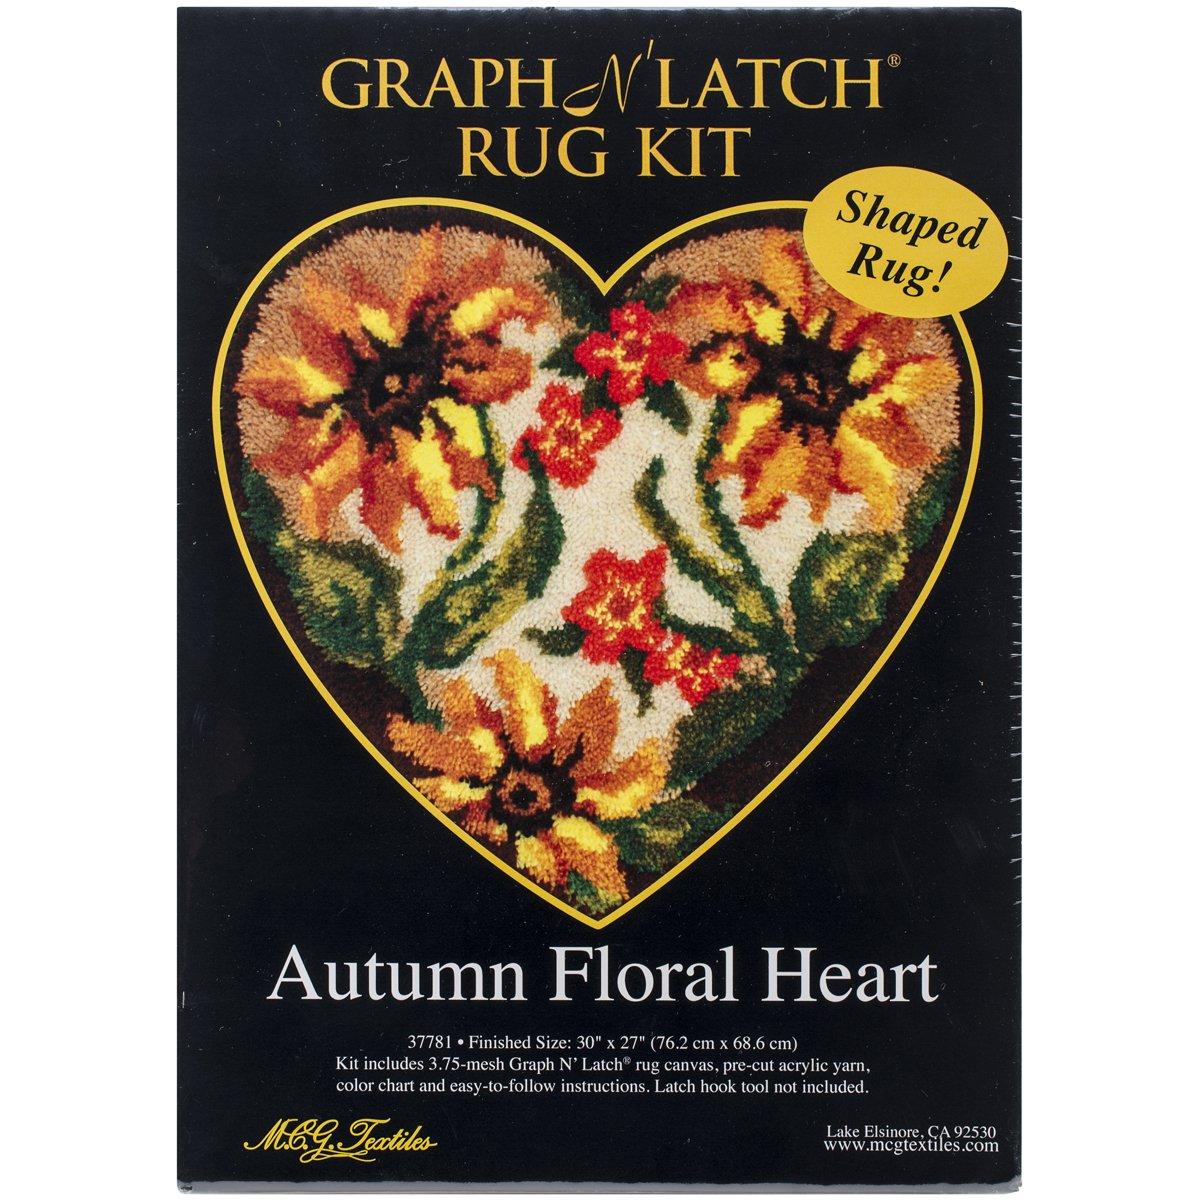 M.C.G. Textiles Latch Hook Kit, 30 by 27-Inch, Autumn Floral Heart MCG Textiles 37781